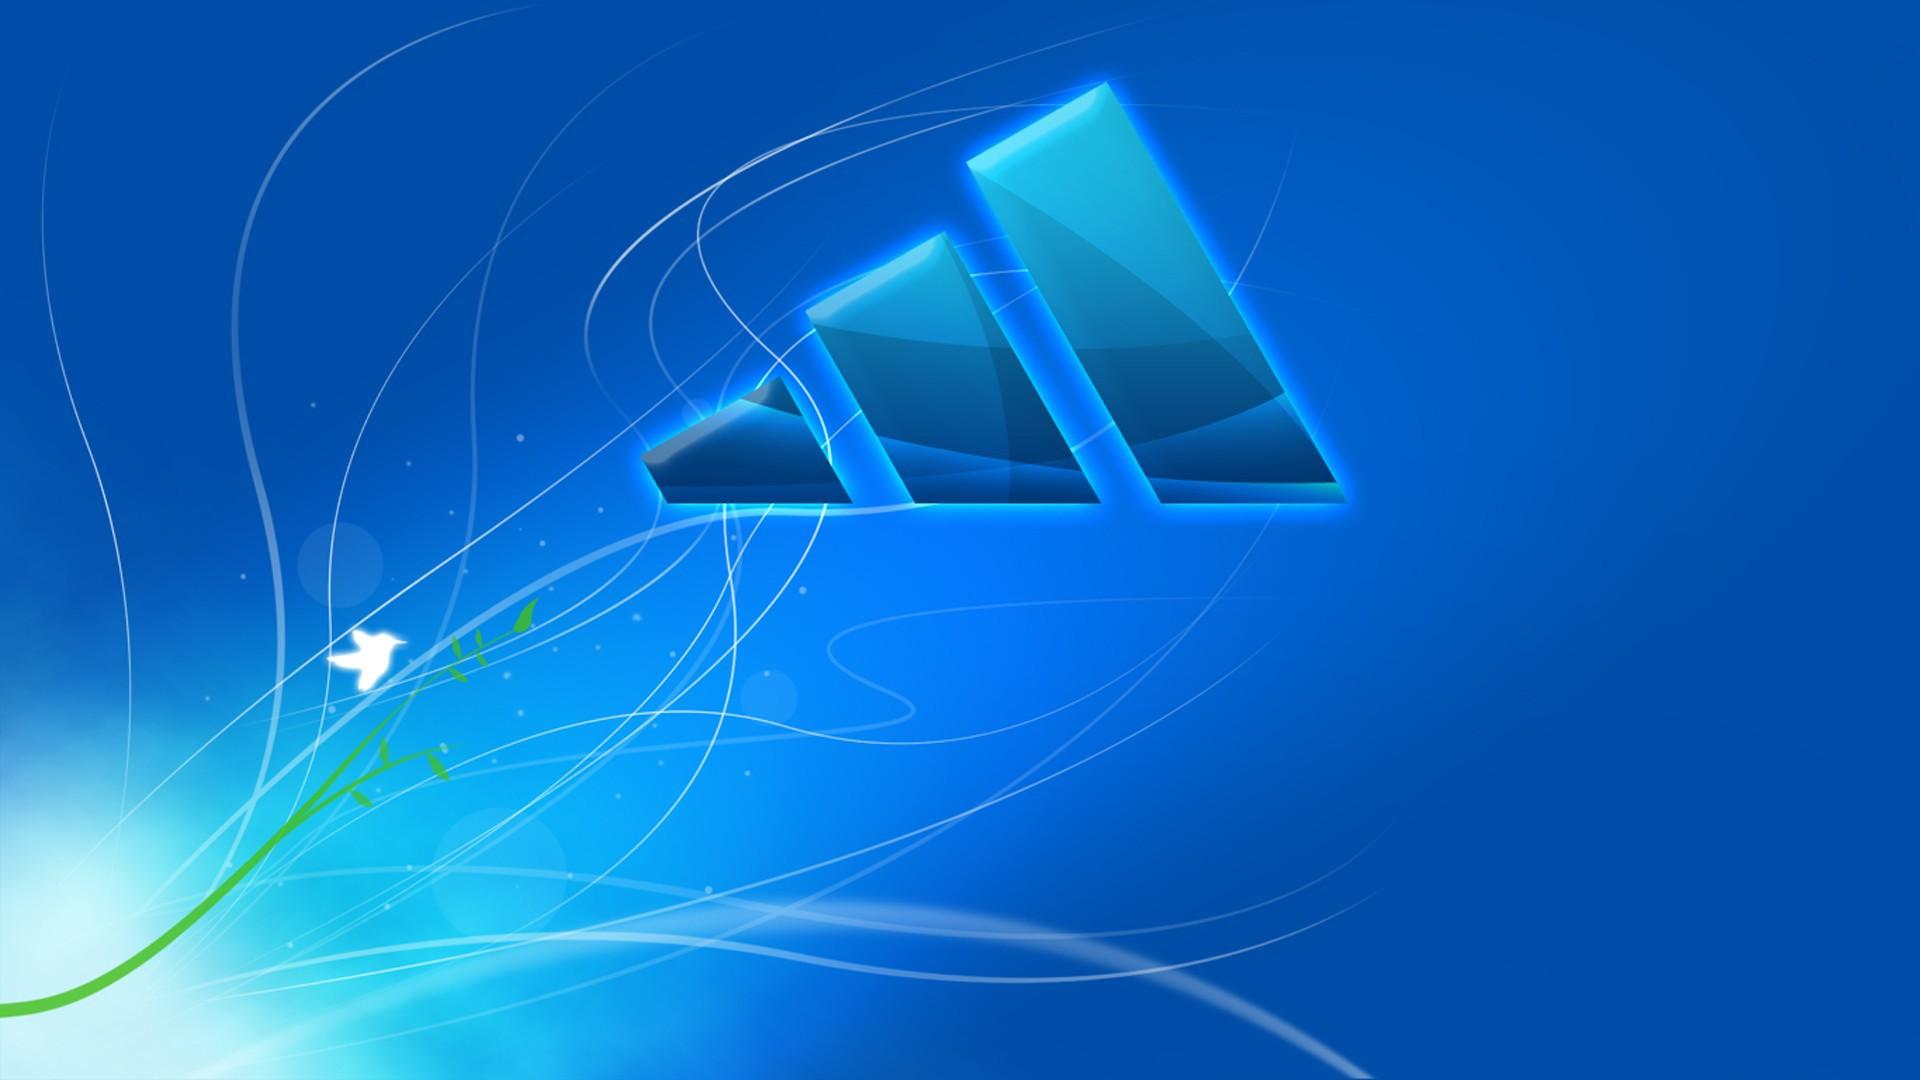 adidas blue logo 1920x1080 - photo #20